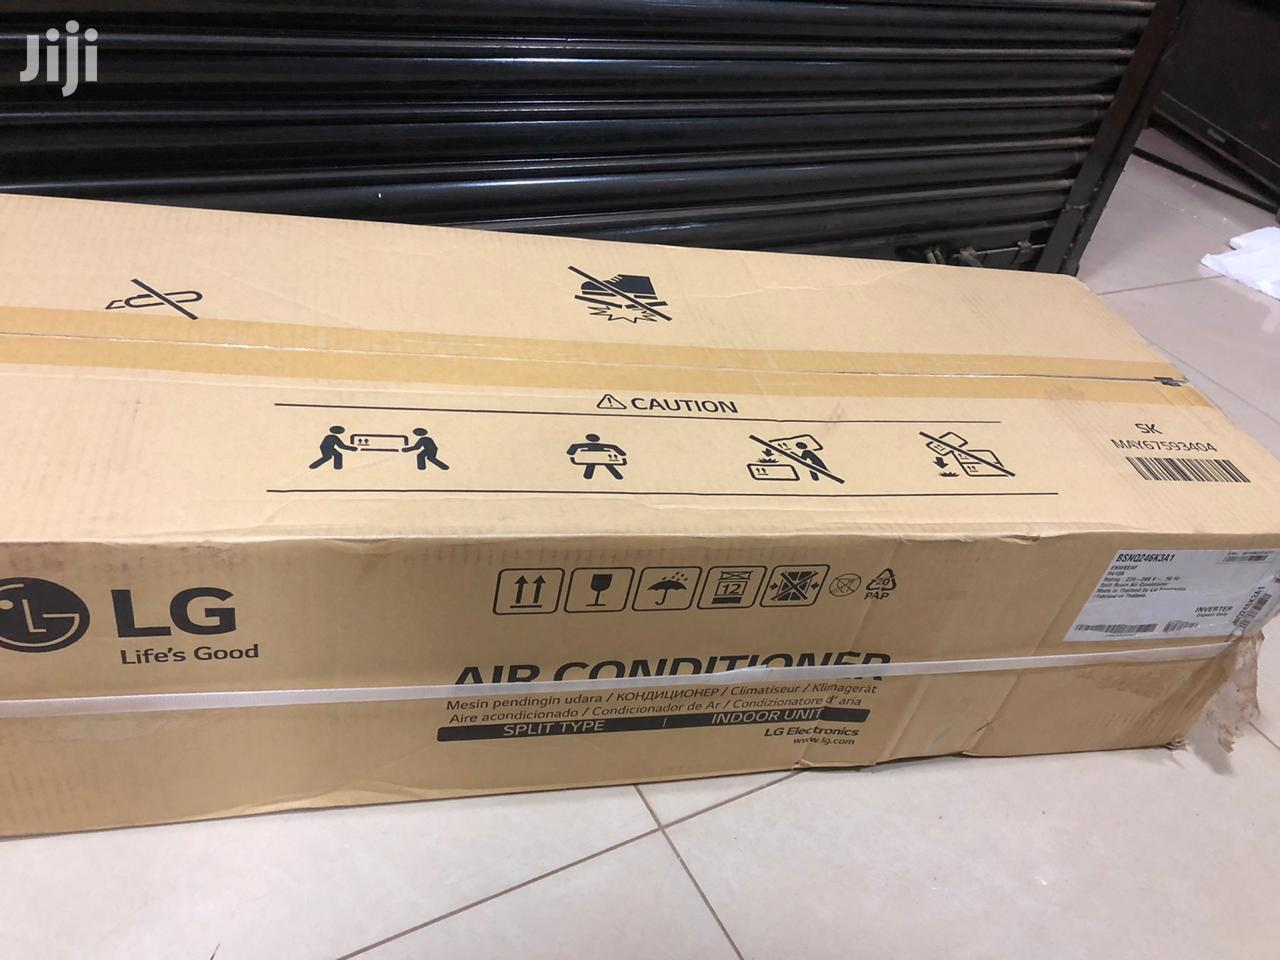 LG Air Conditioner Split | Home Appliances for sale in Kampala, Central Region, Uganda